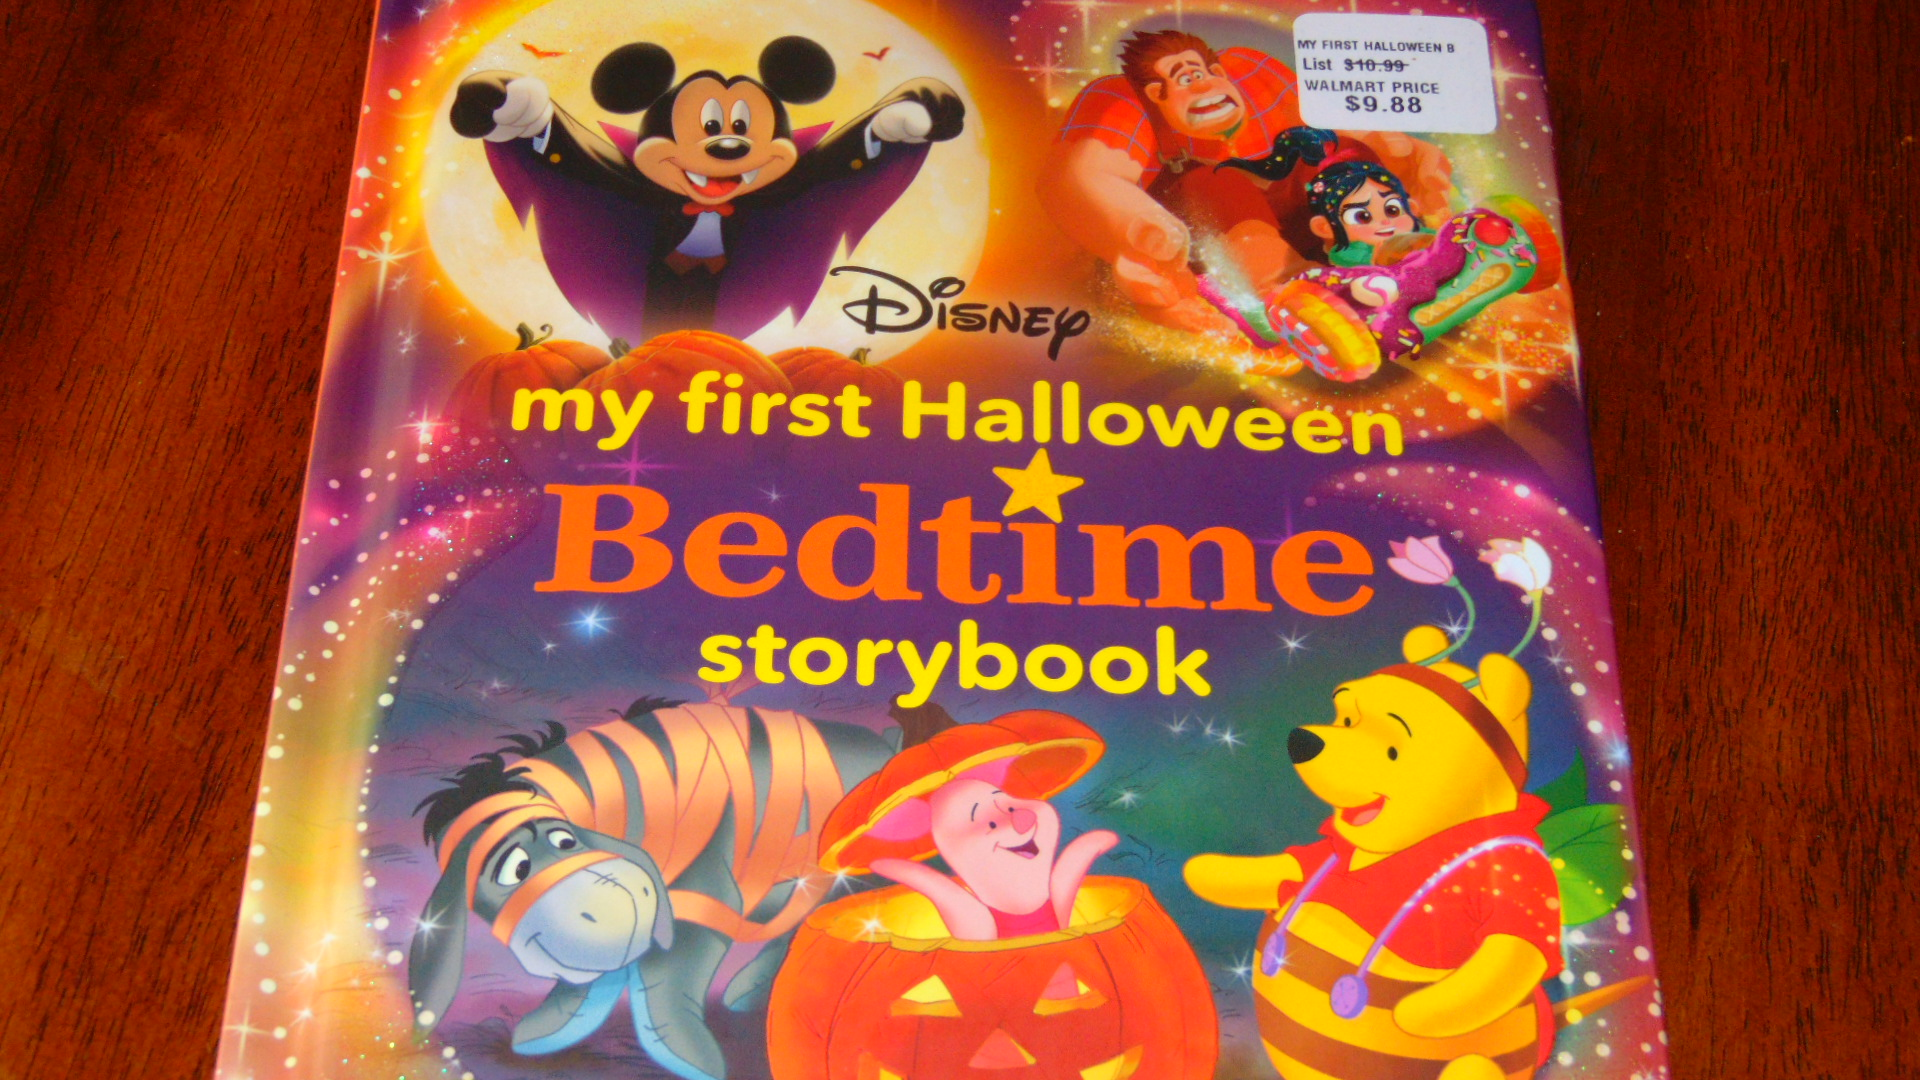 Halloween story book.